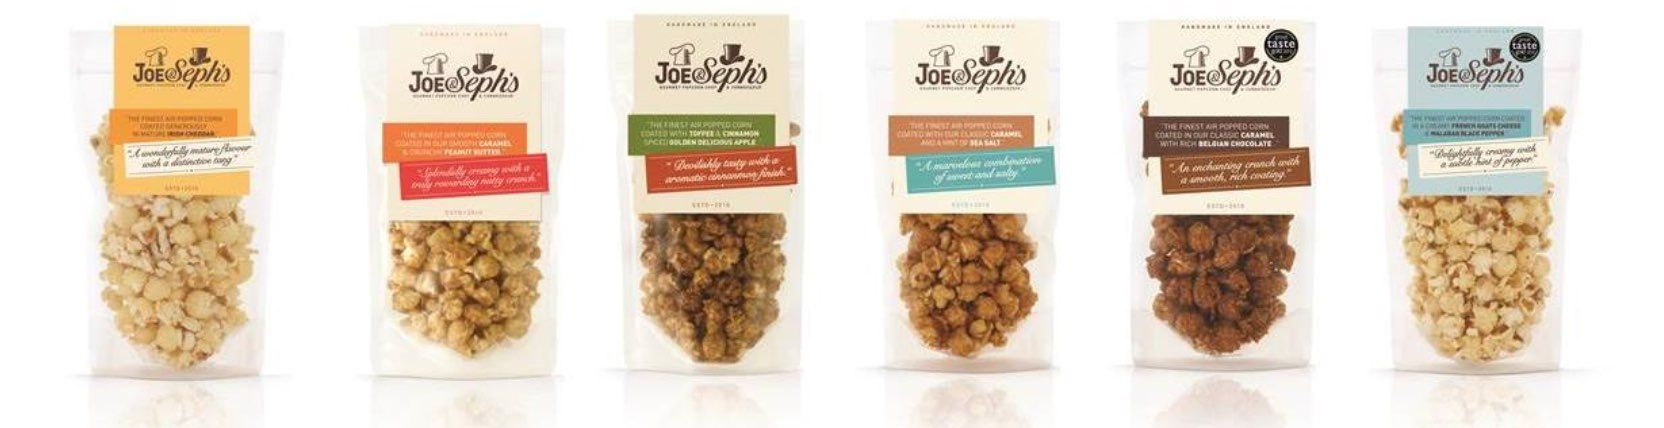 Foto de JOE&SEPH'S, las palomitas gourmet fabricadas con ingredientes